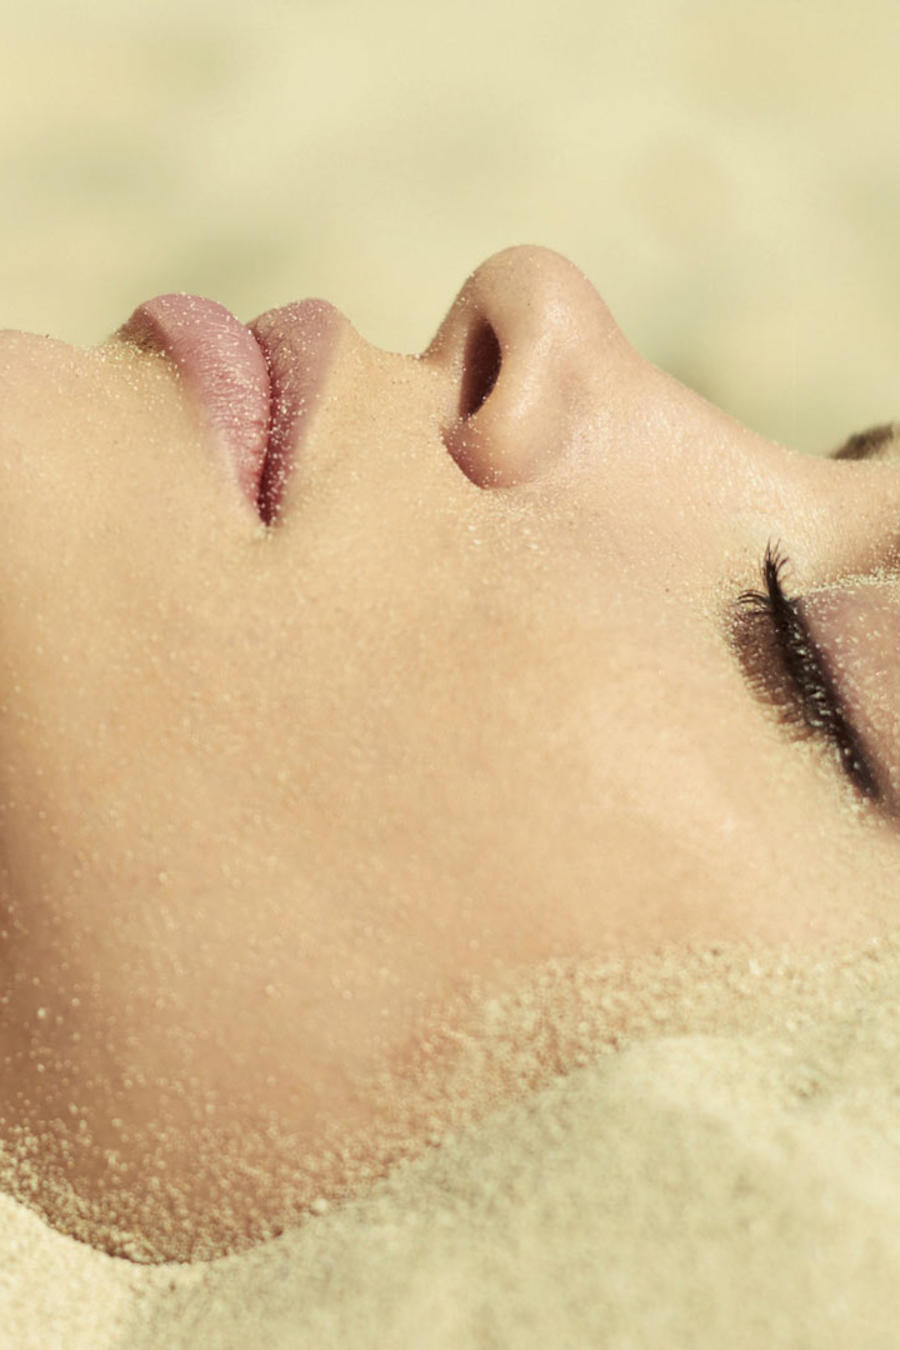 terapia de arena caliente